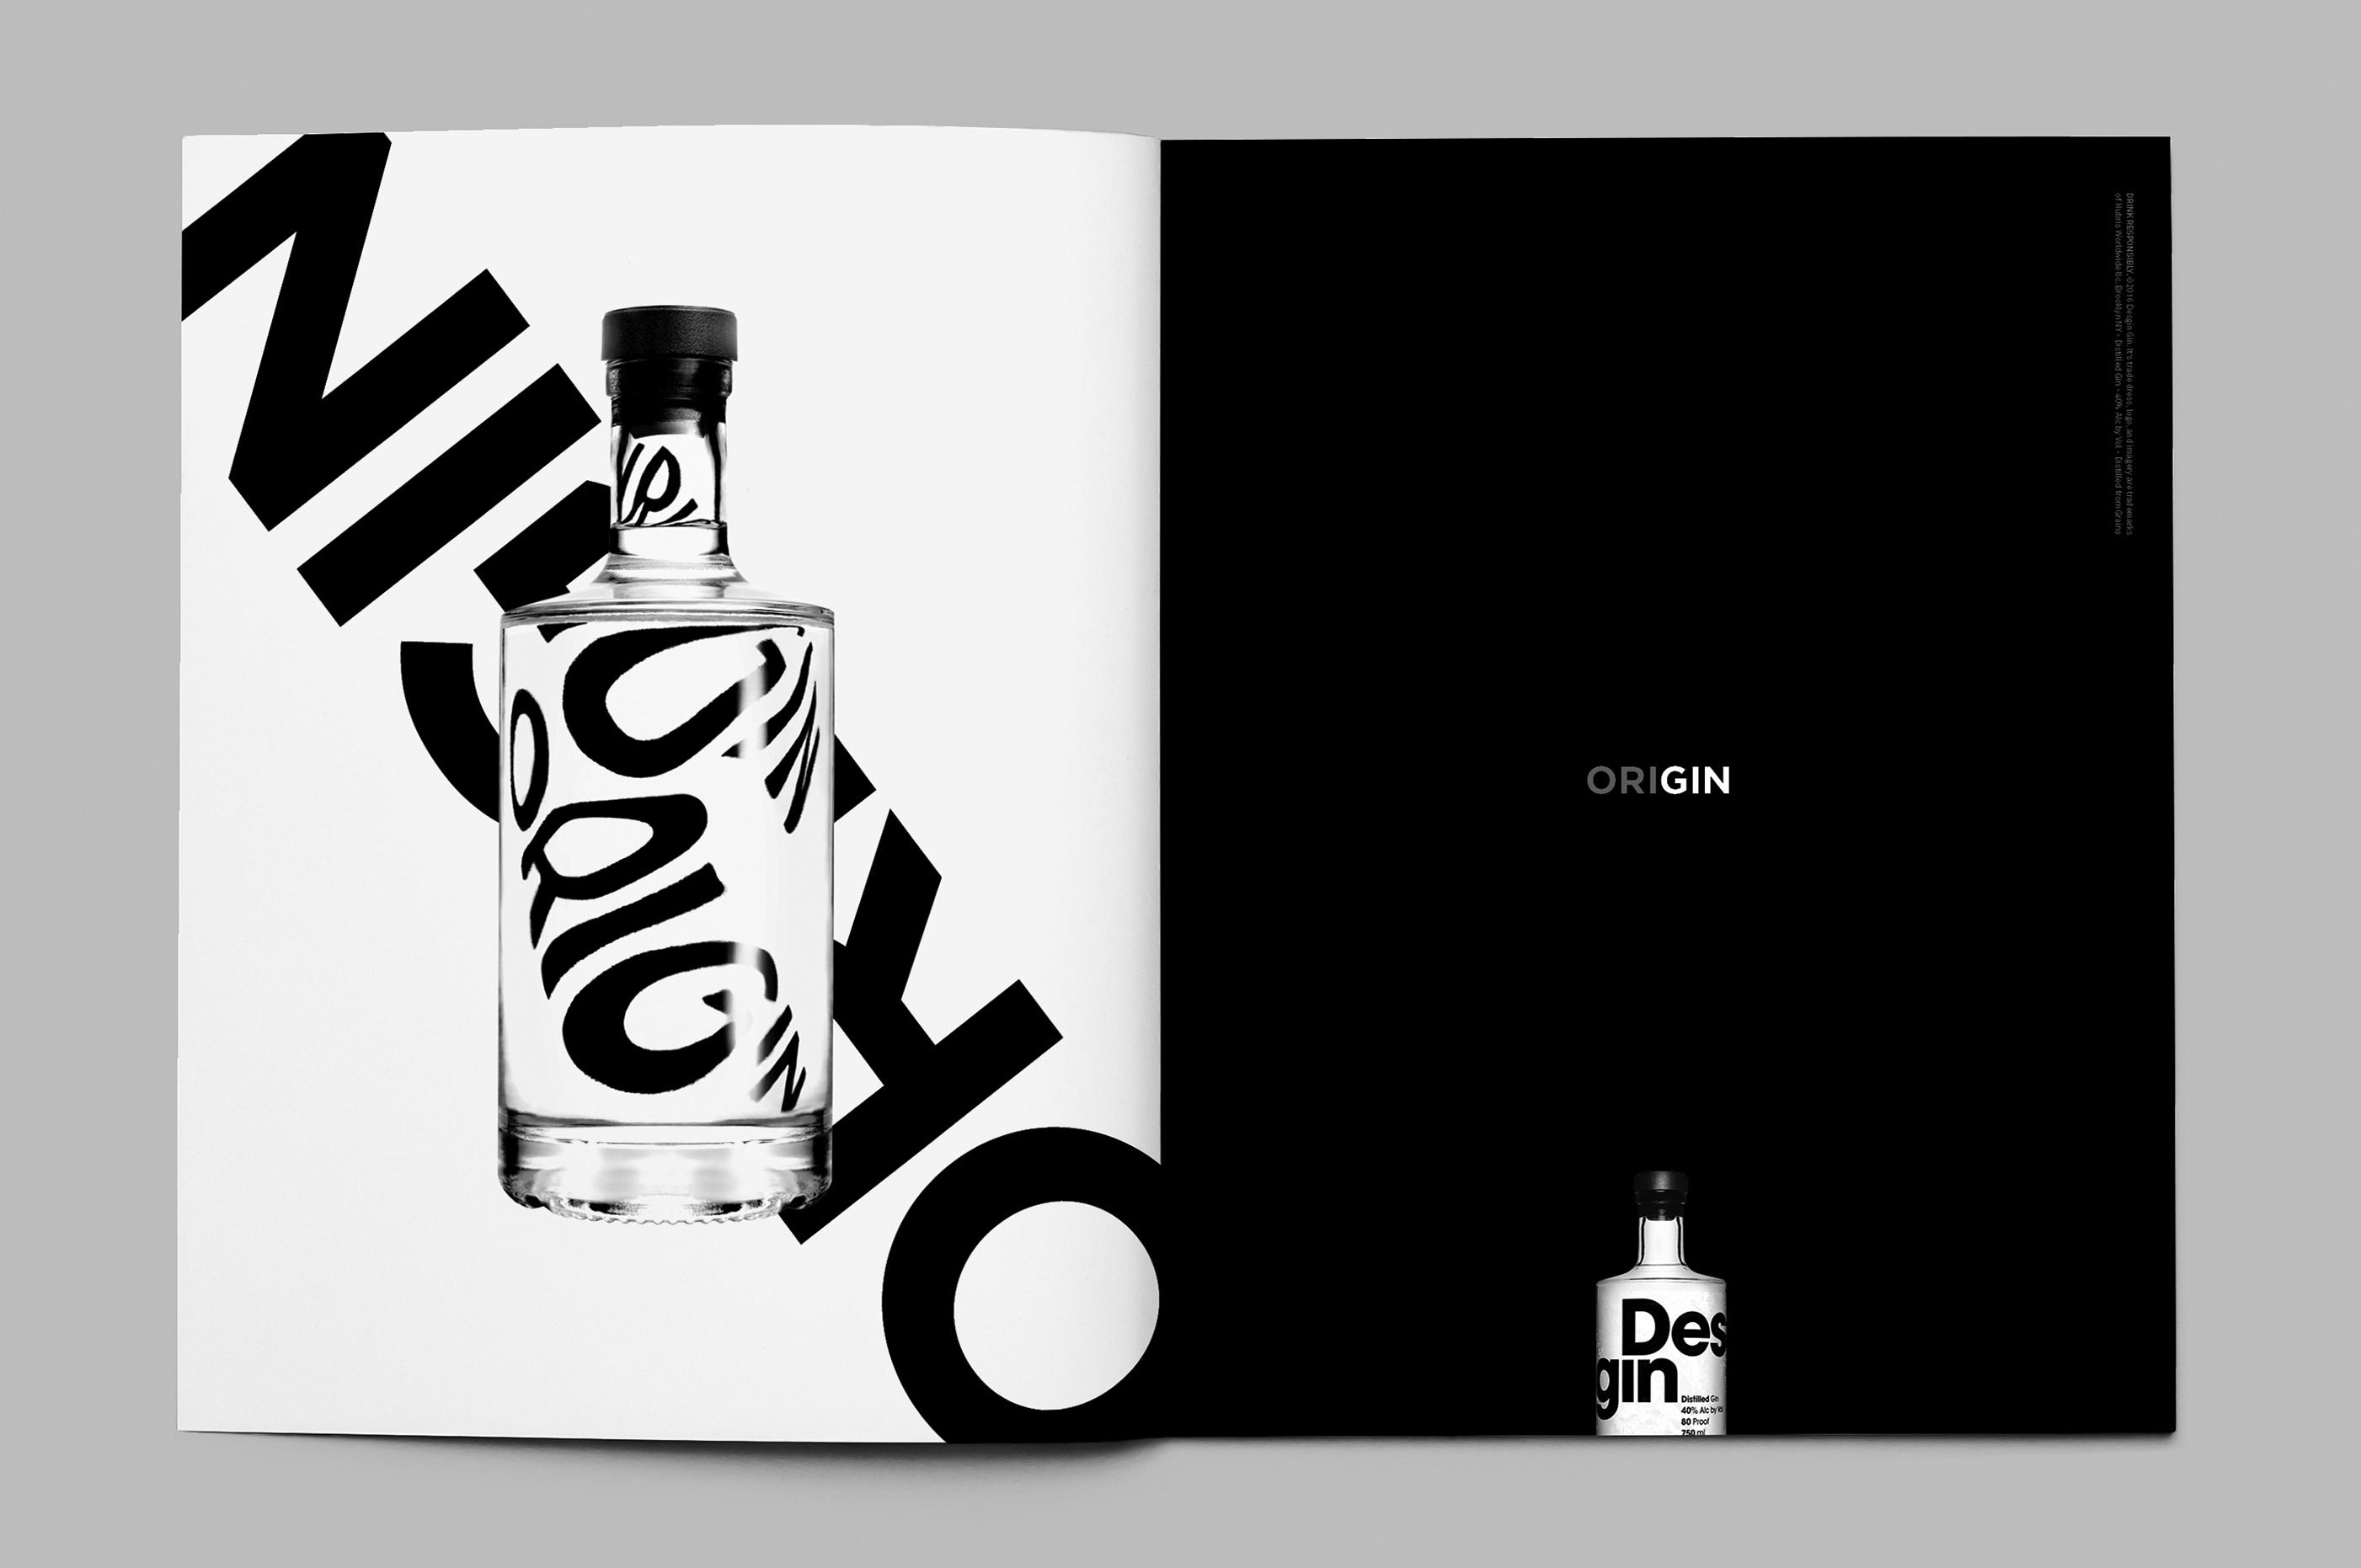 Desgin magazine 16